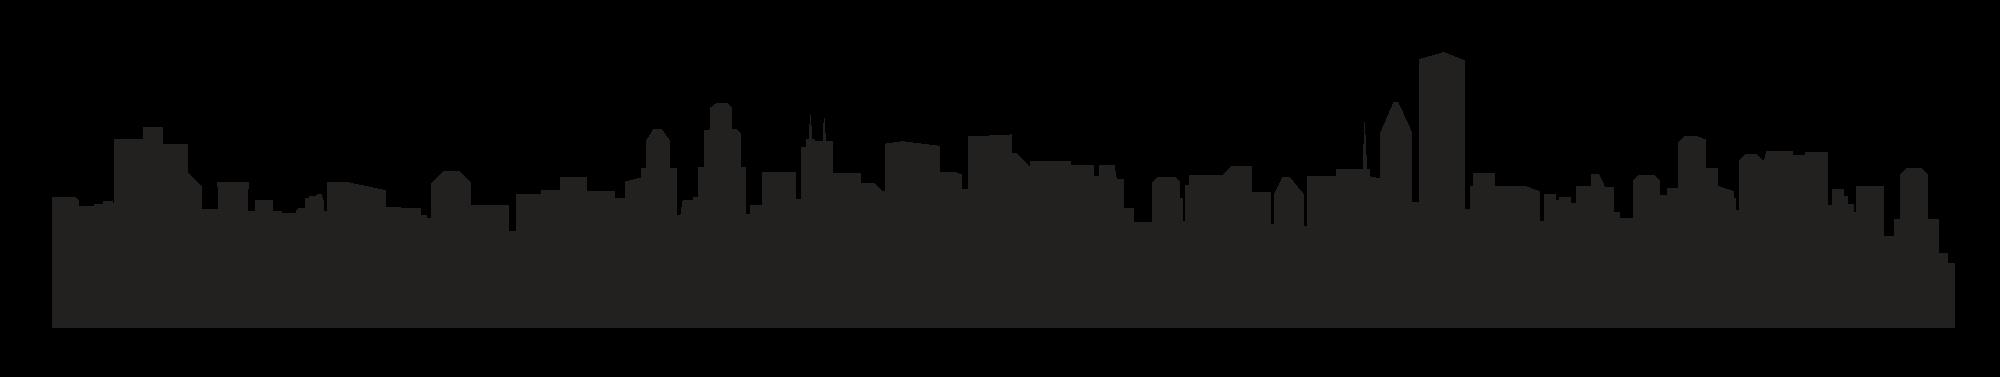 stc-skyline